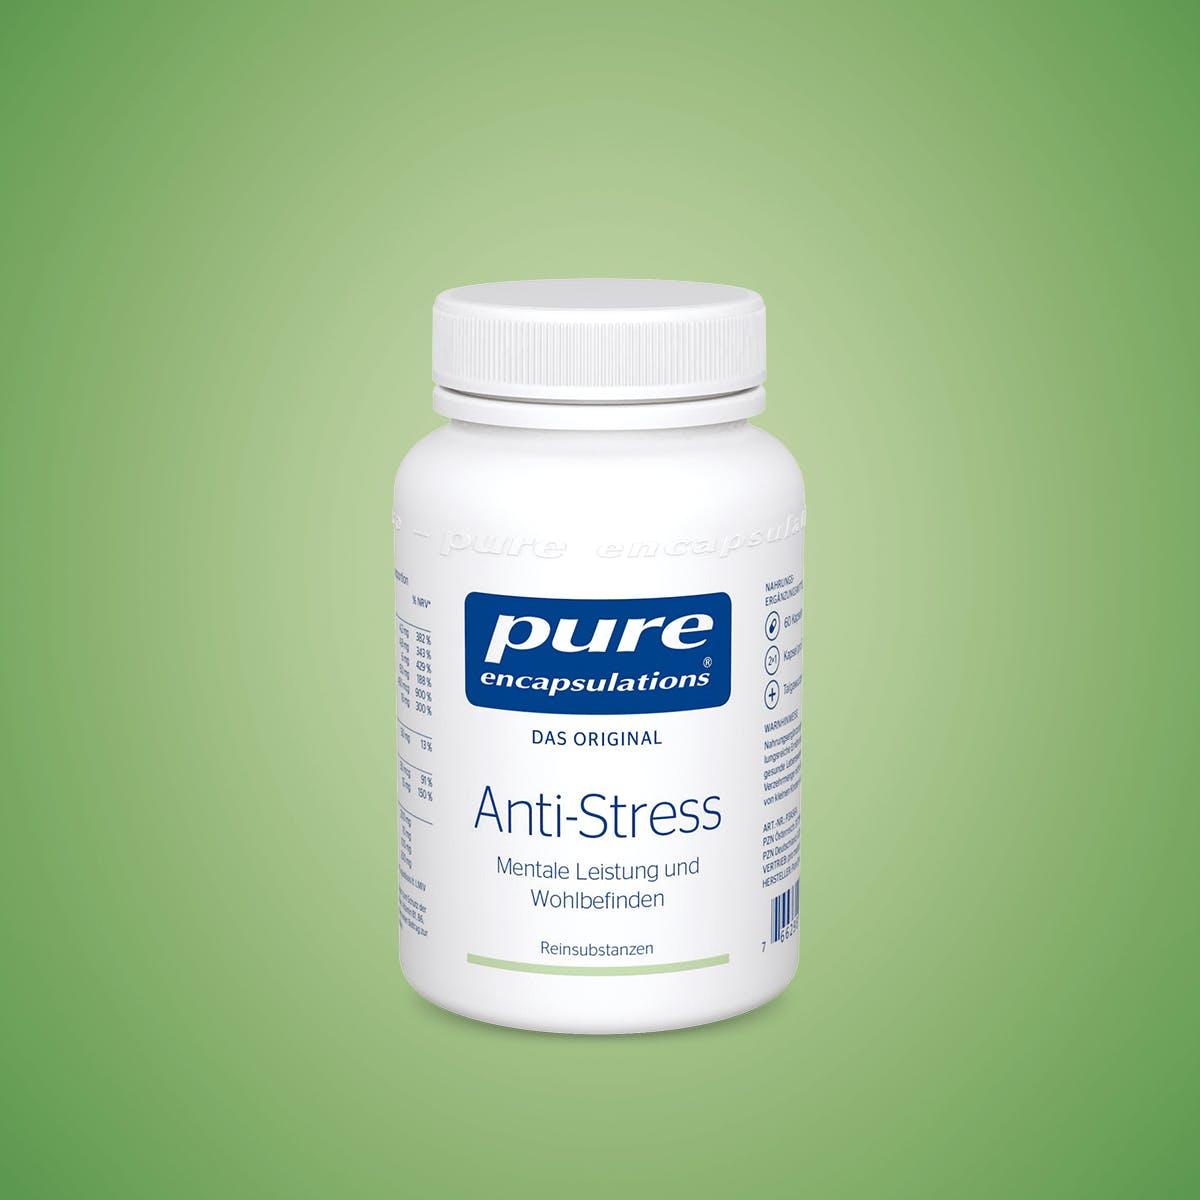 Anti Stress Produkt von Pure Encapsulations